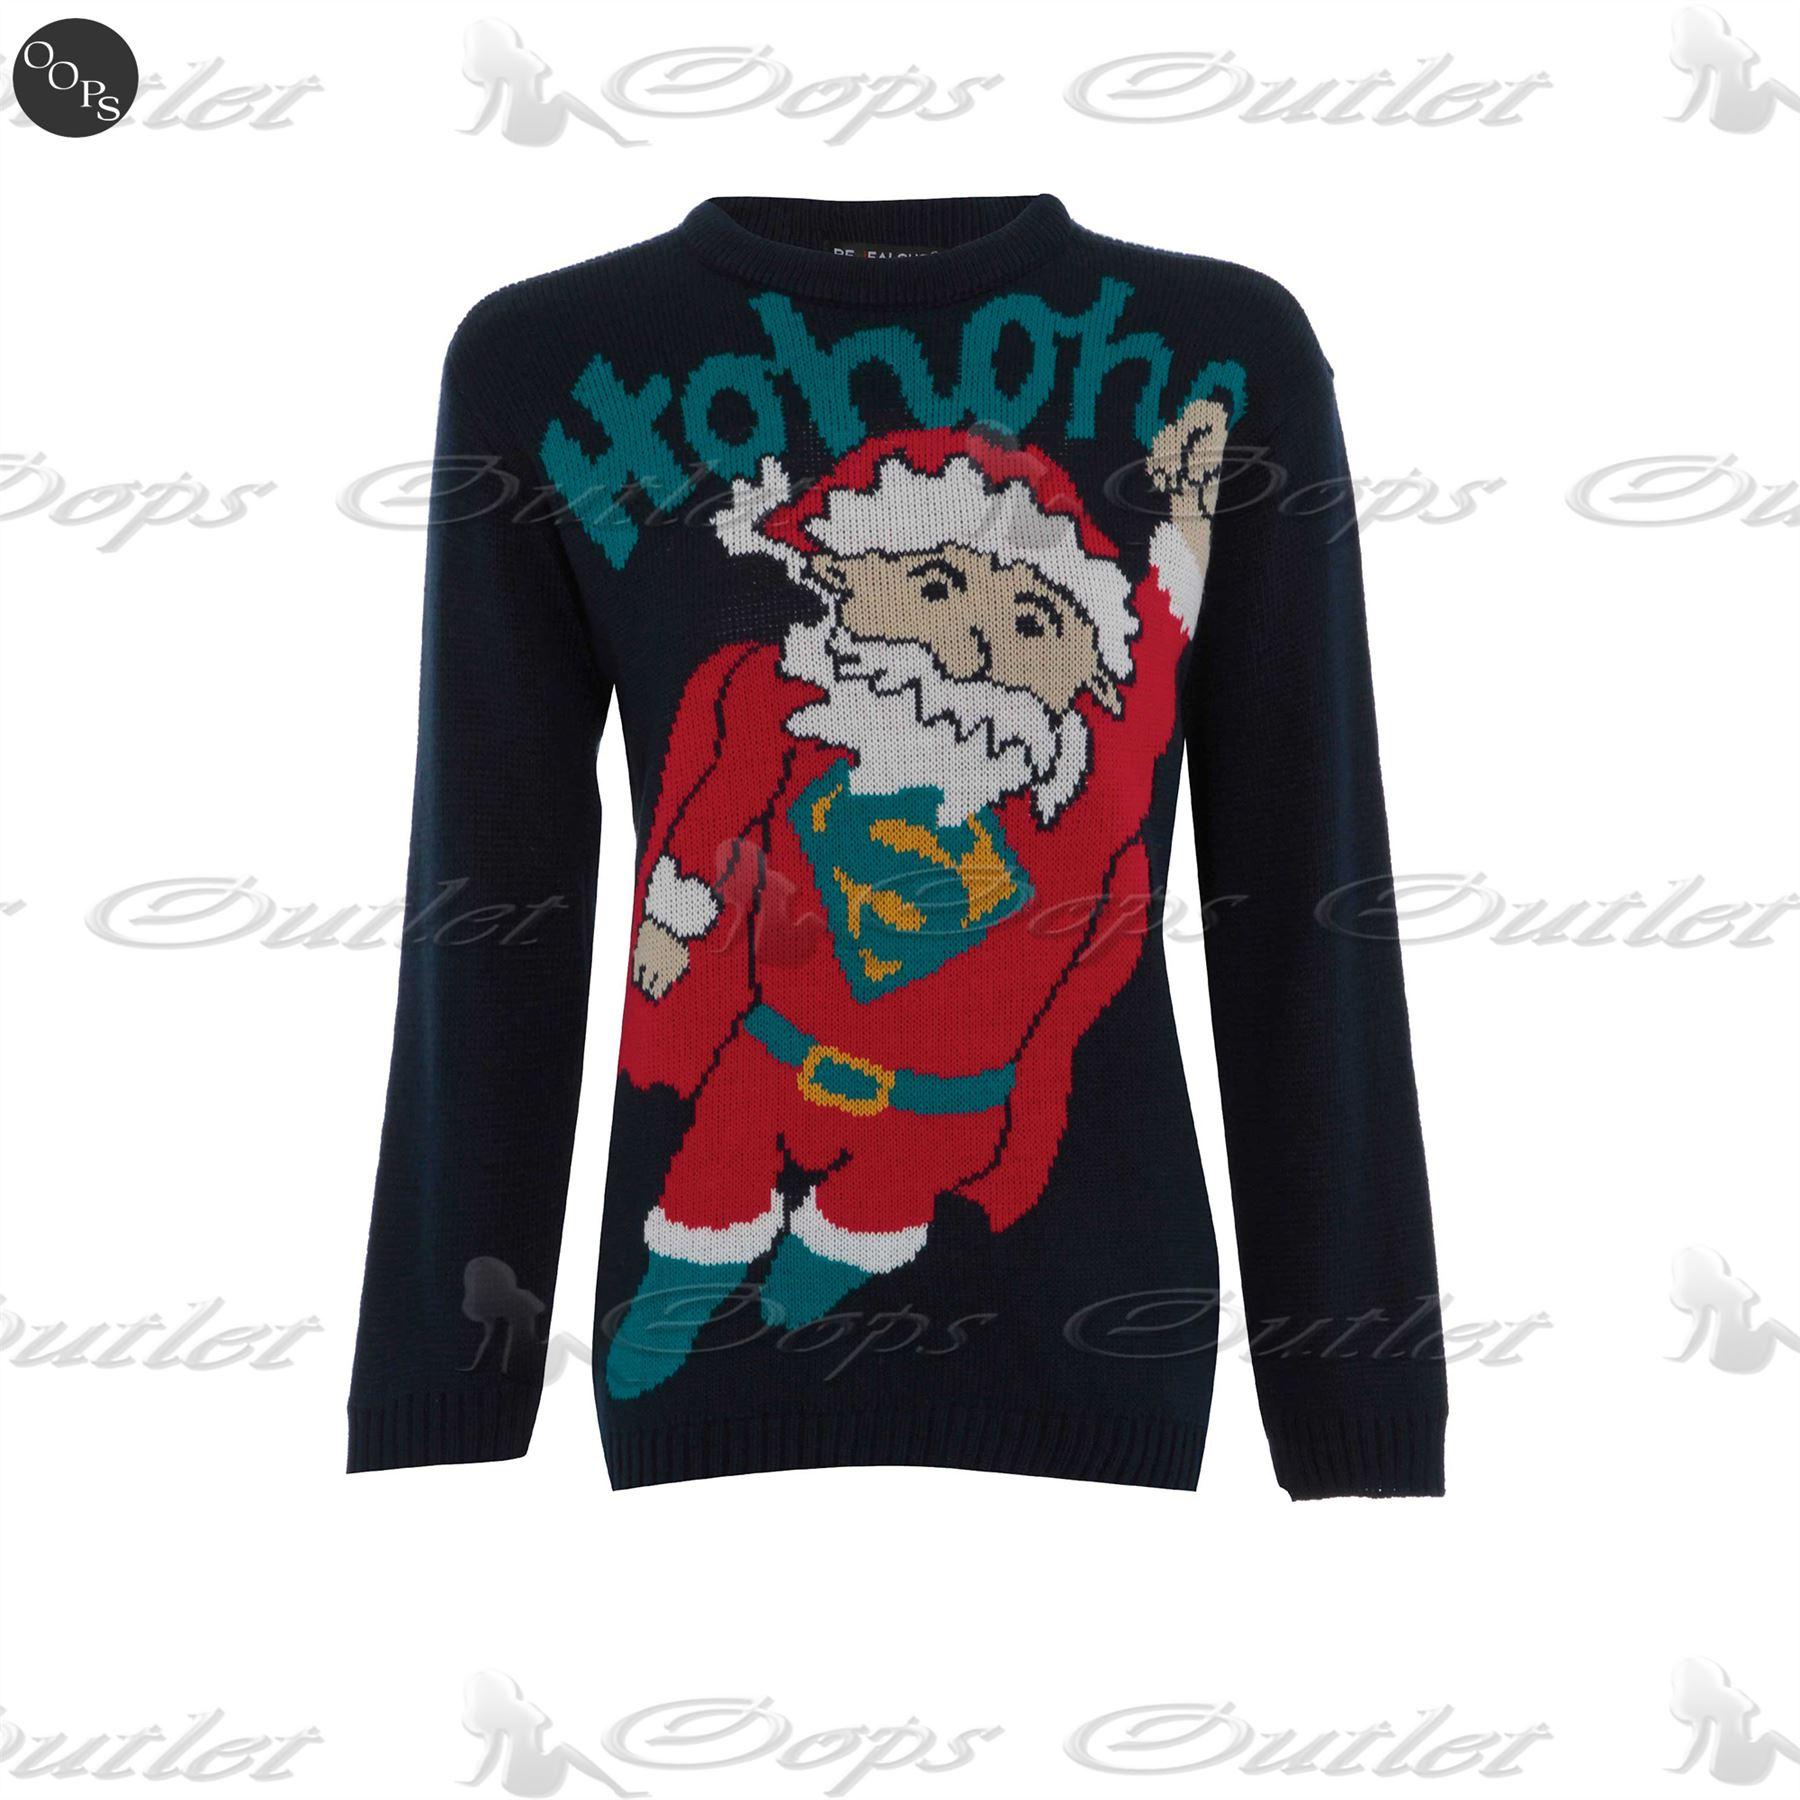 CLEARANCE SALE Boys Girls Novelty Christmas Sweater Batman Superman Santa Jumper